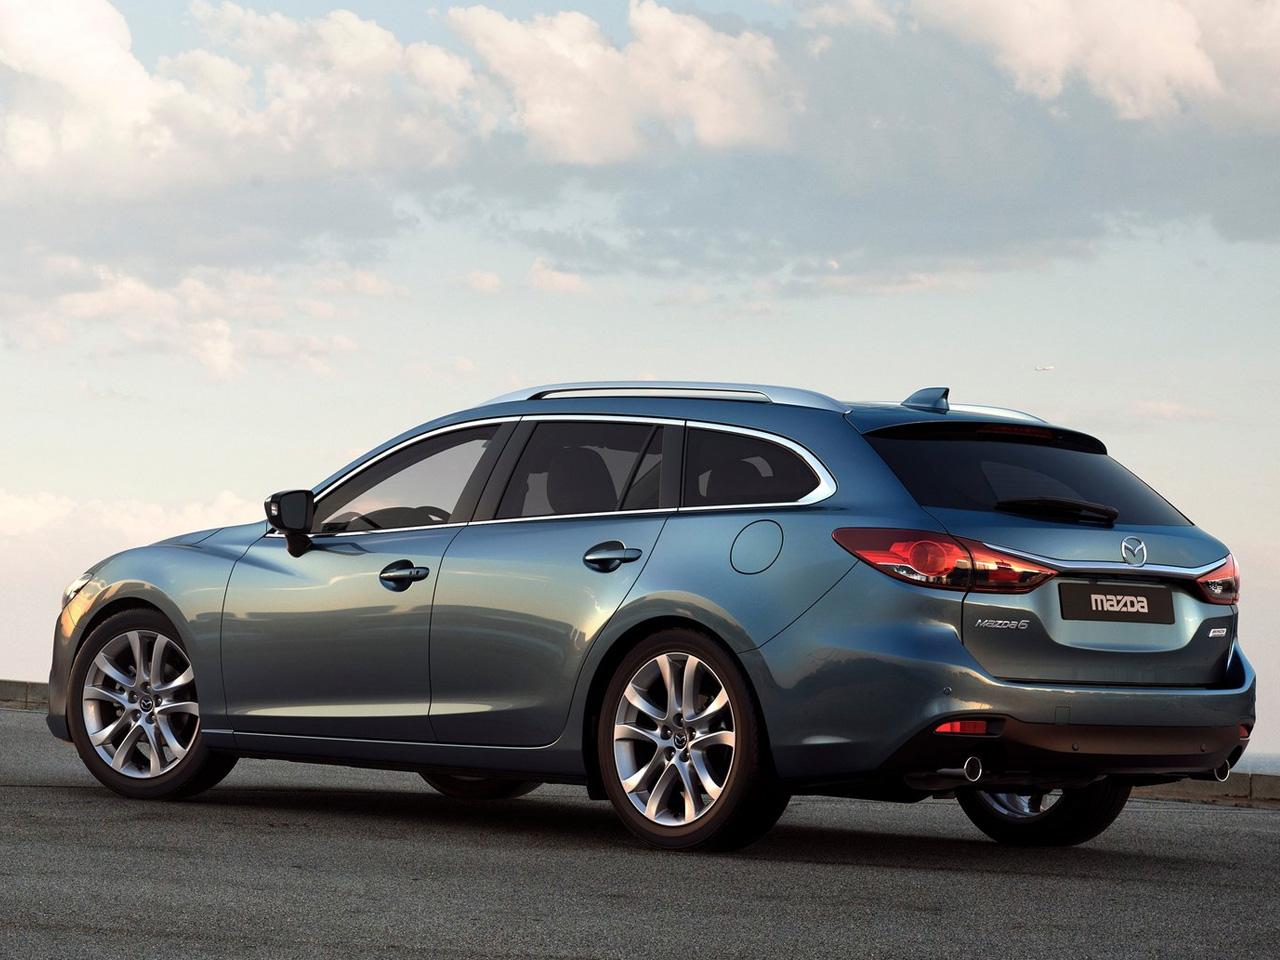 2013 Mazda 6 Wagon - wallpaper world